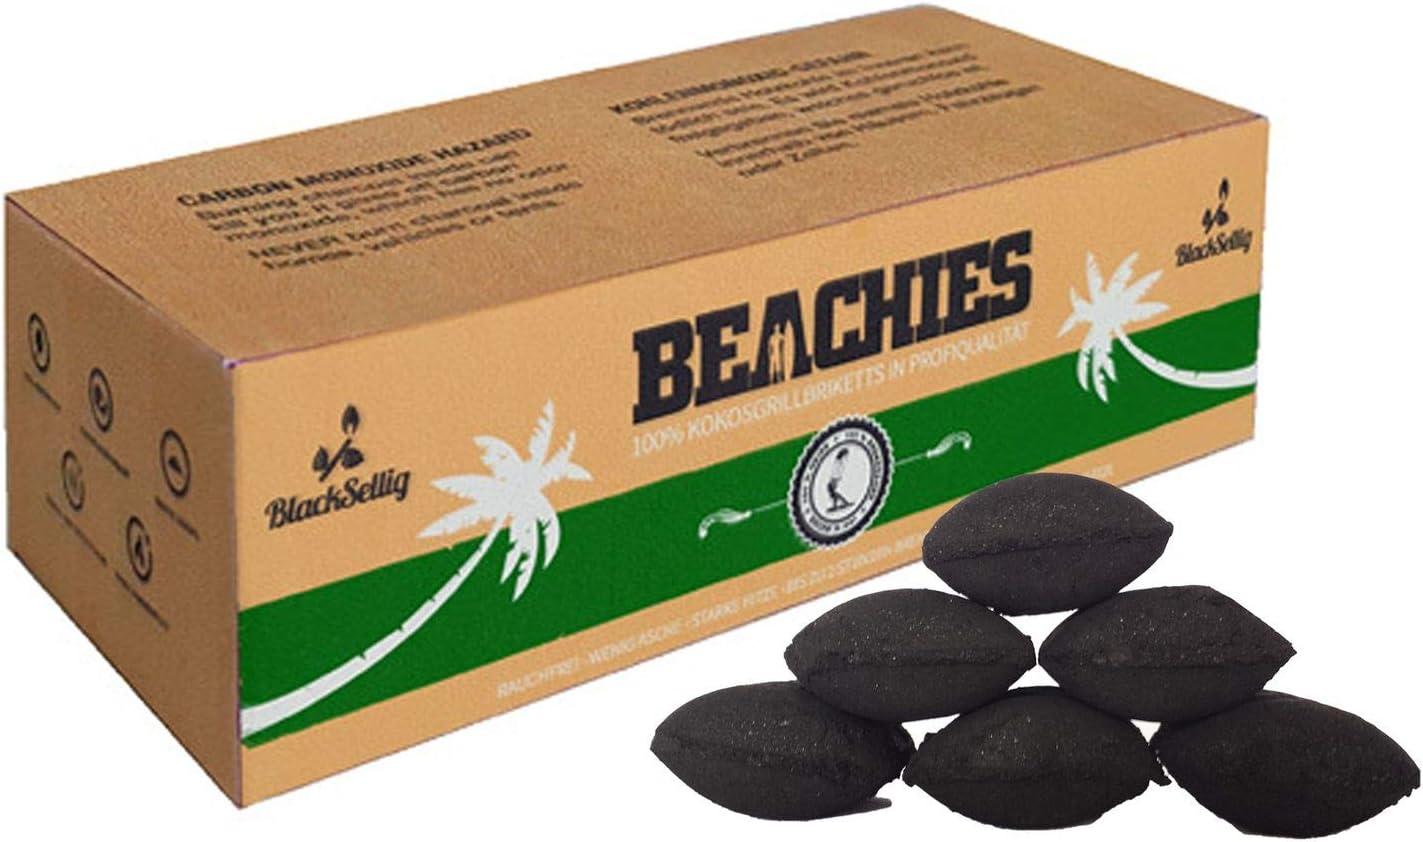 perfekte Profiqualit/ät f/ür den Short Job BlackSellig 20 Kg Beachies Kokos Grill Briketts Reine Kokosnussschalen Grillkohle